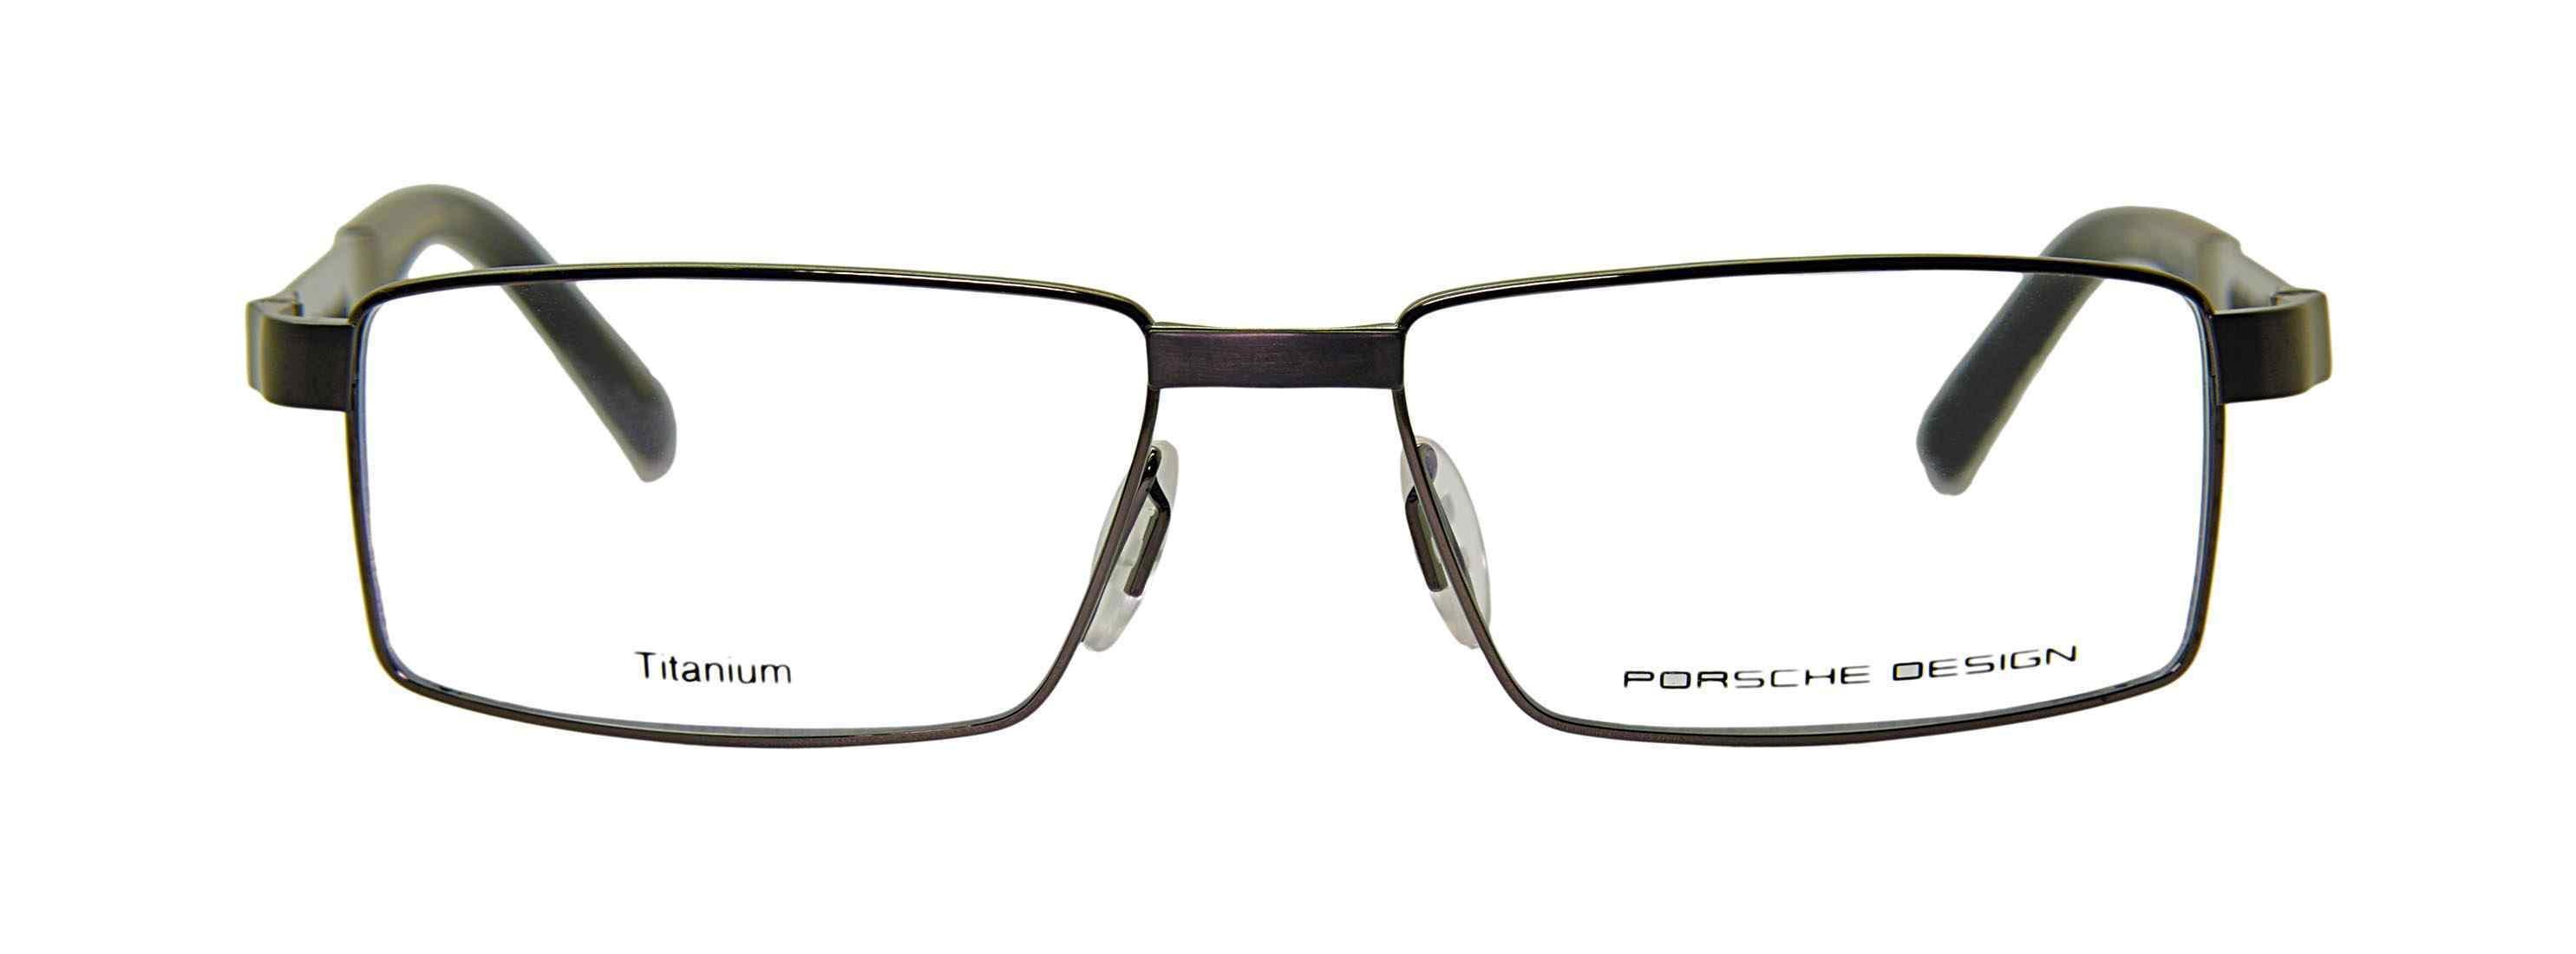 Porsche Design P 8115 C 01 2970x1100